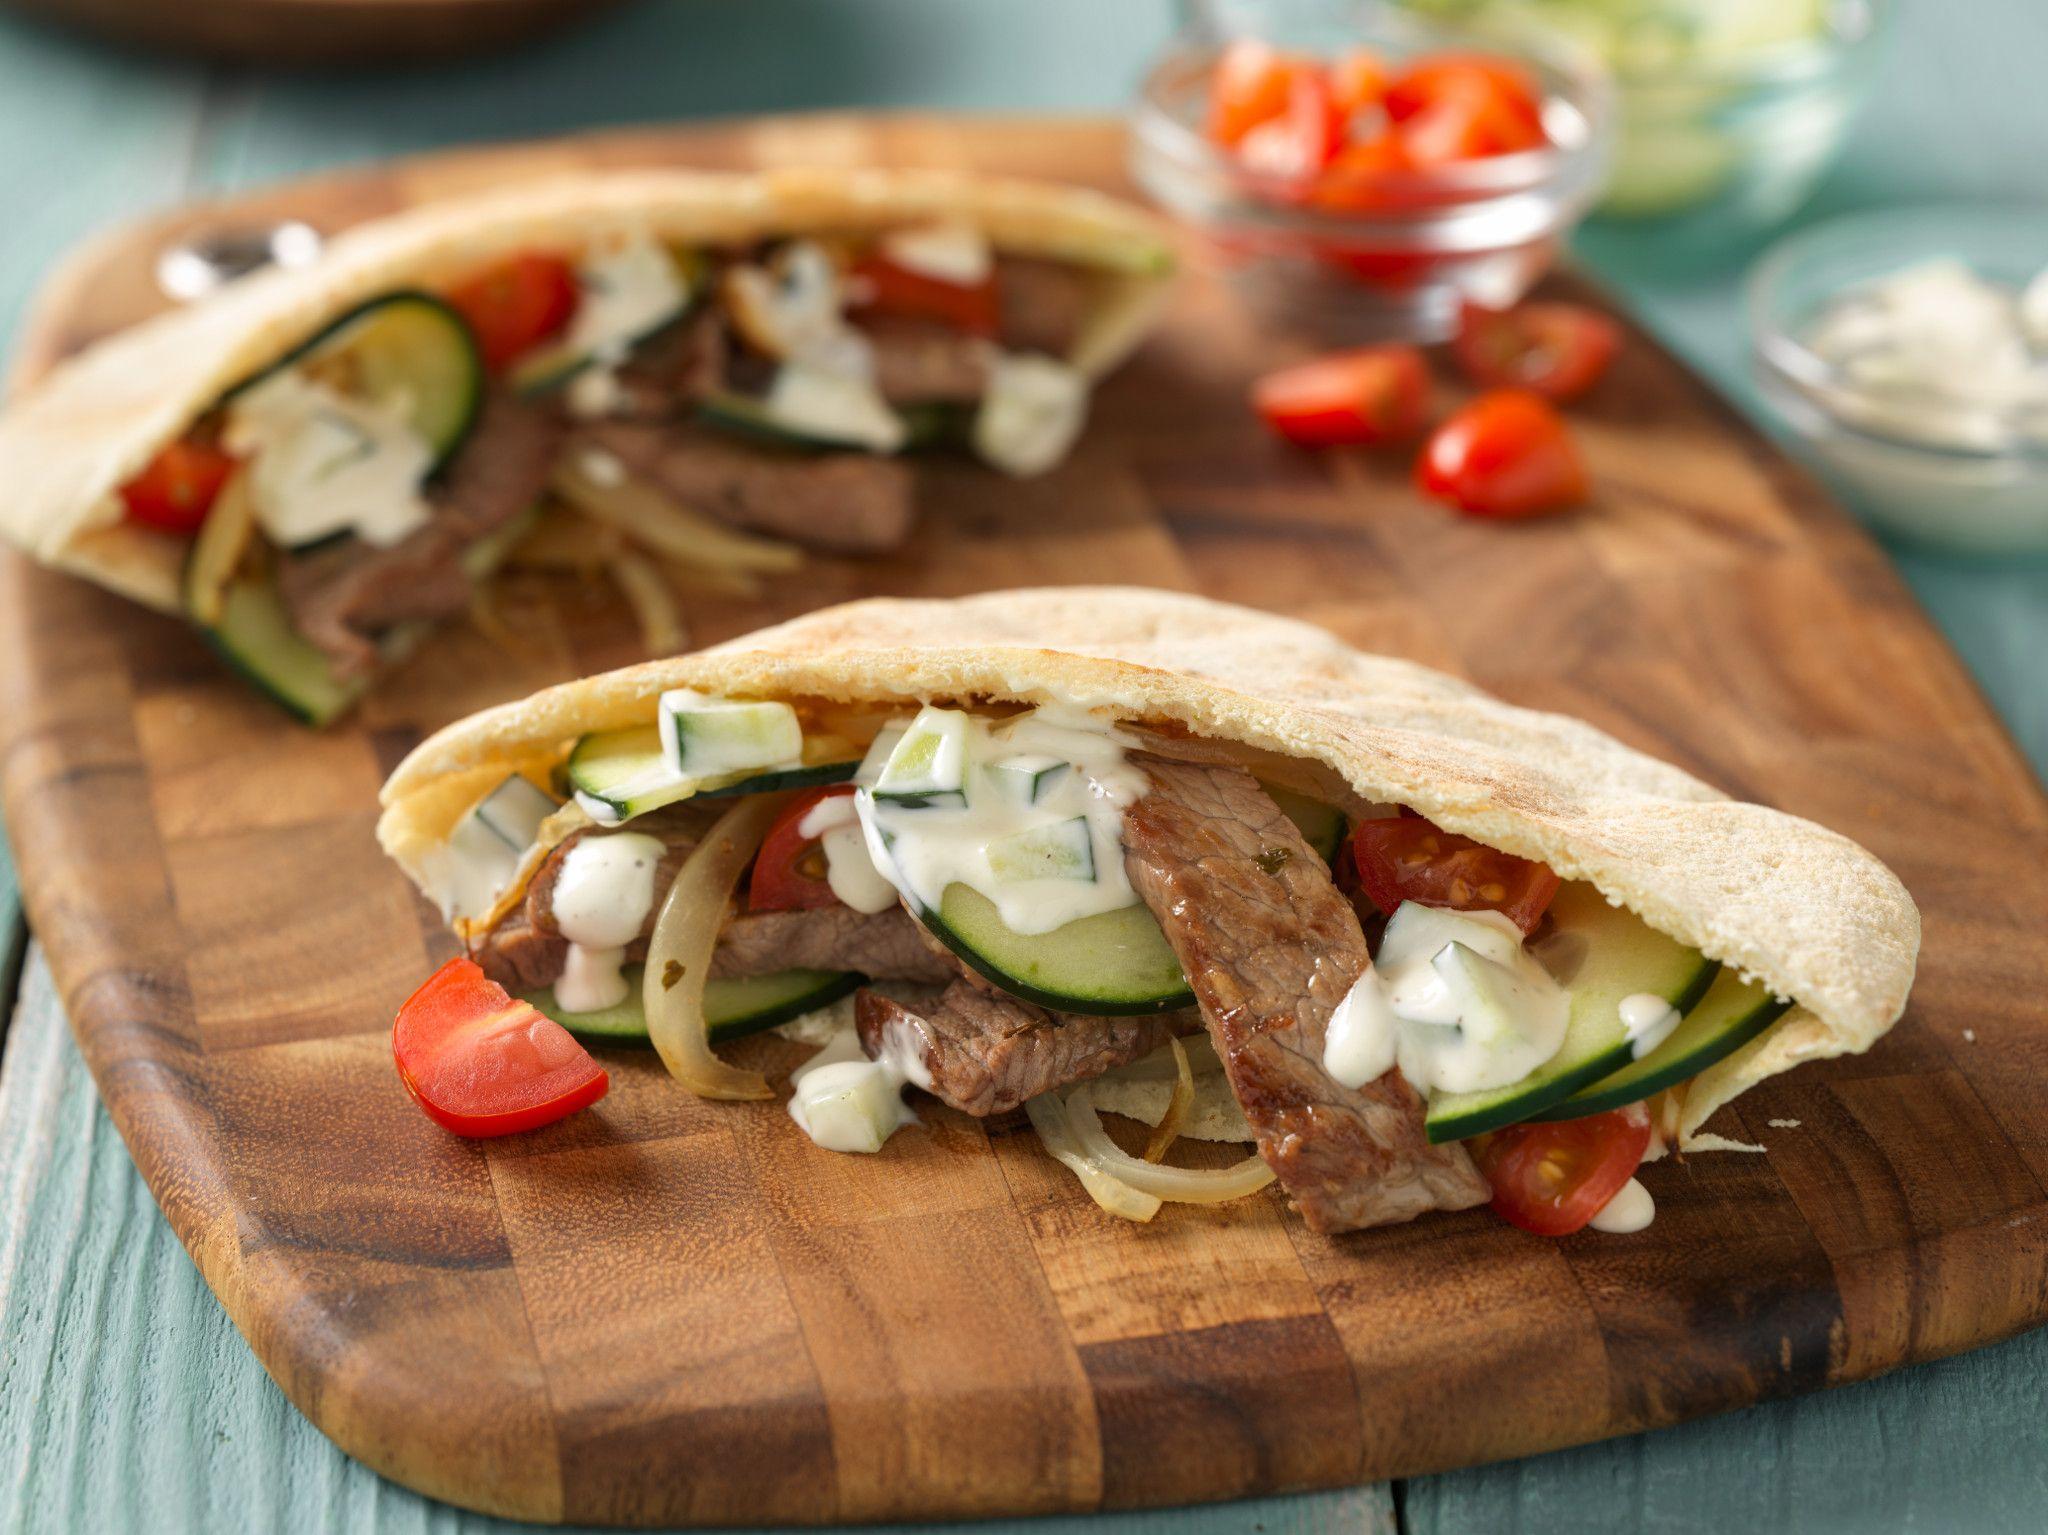 Stir fried beef gyros in pita pockets download high res image forumfinder Images